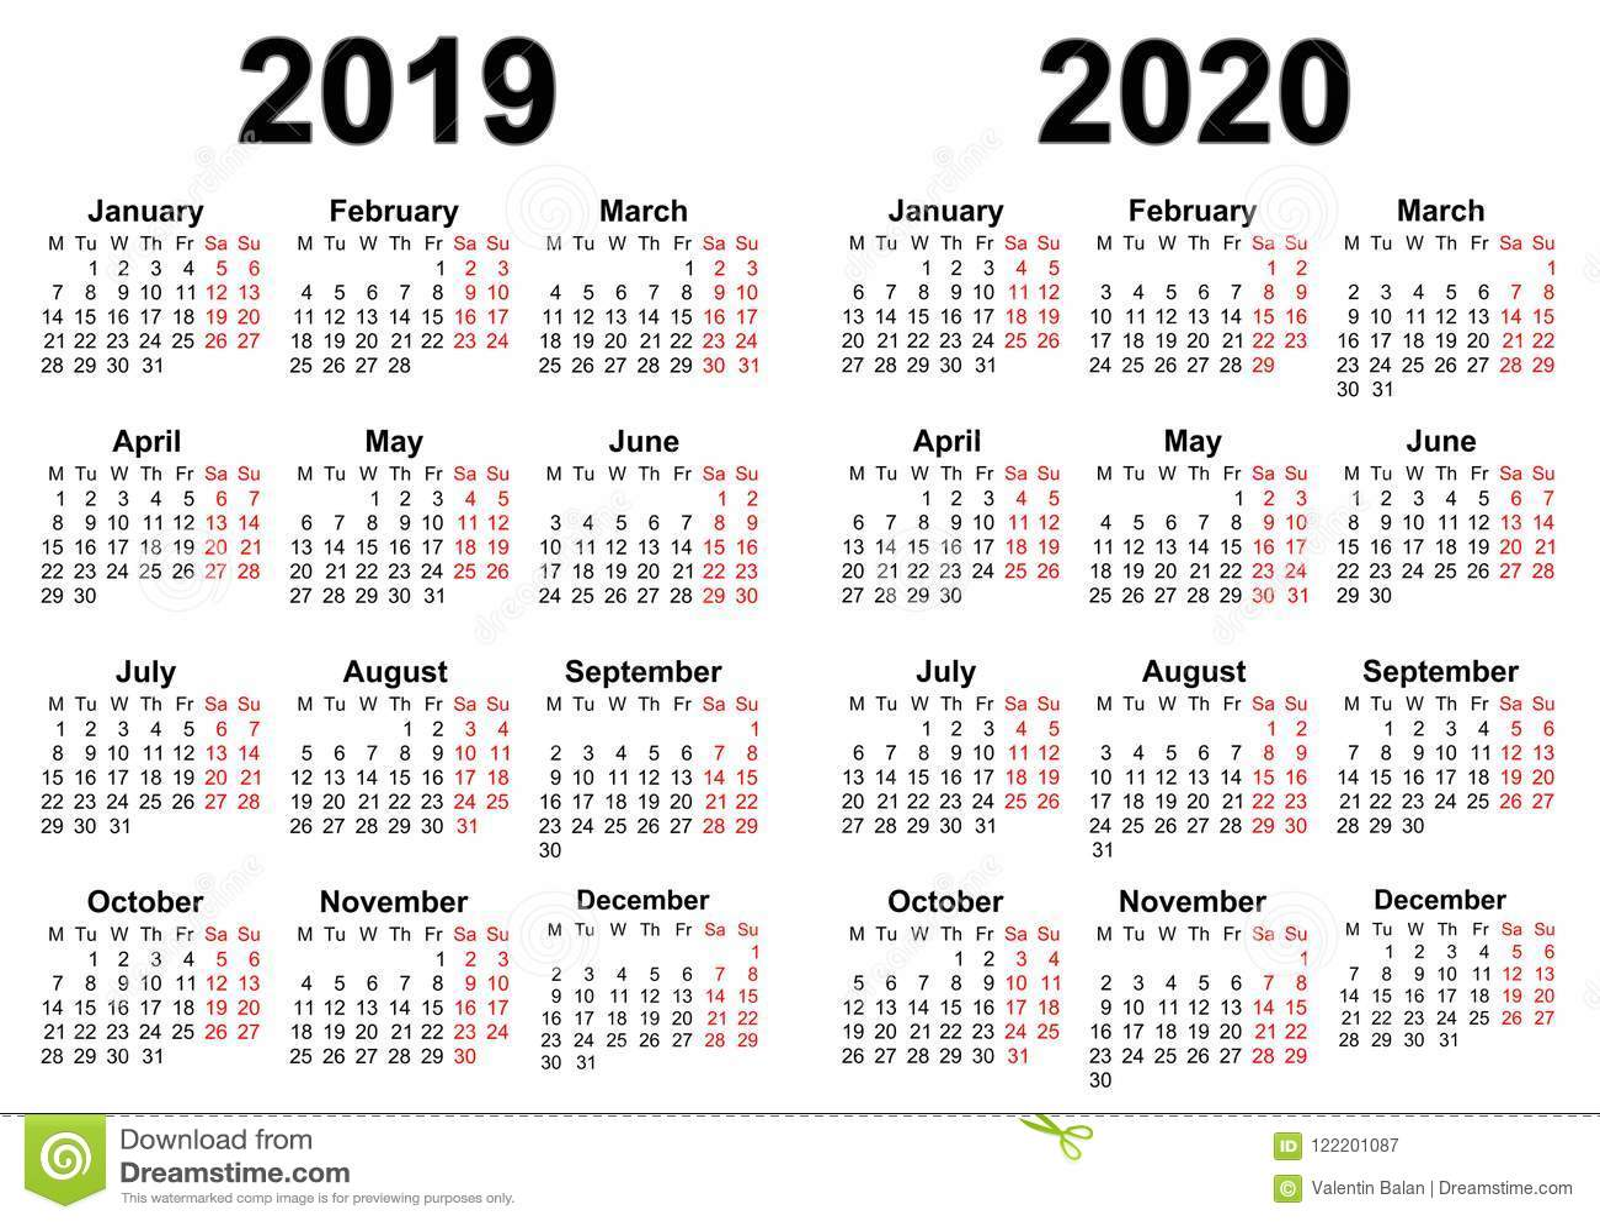 Календарь на 2019 и 2020